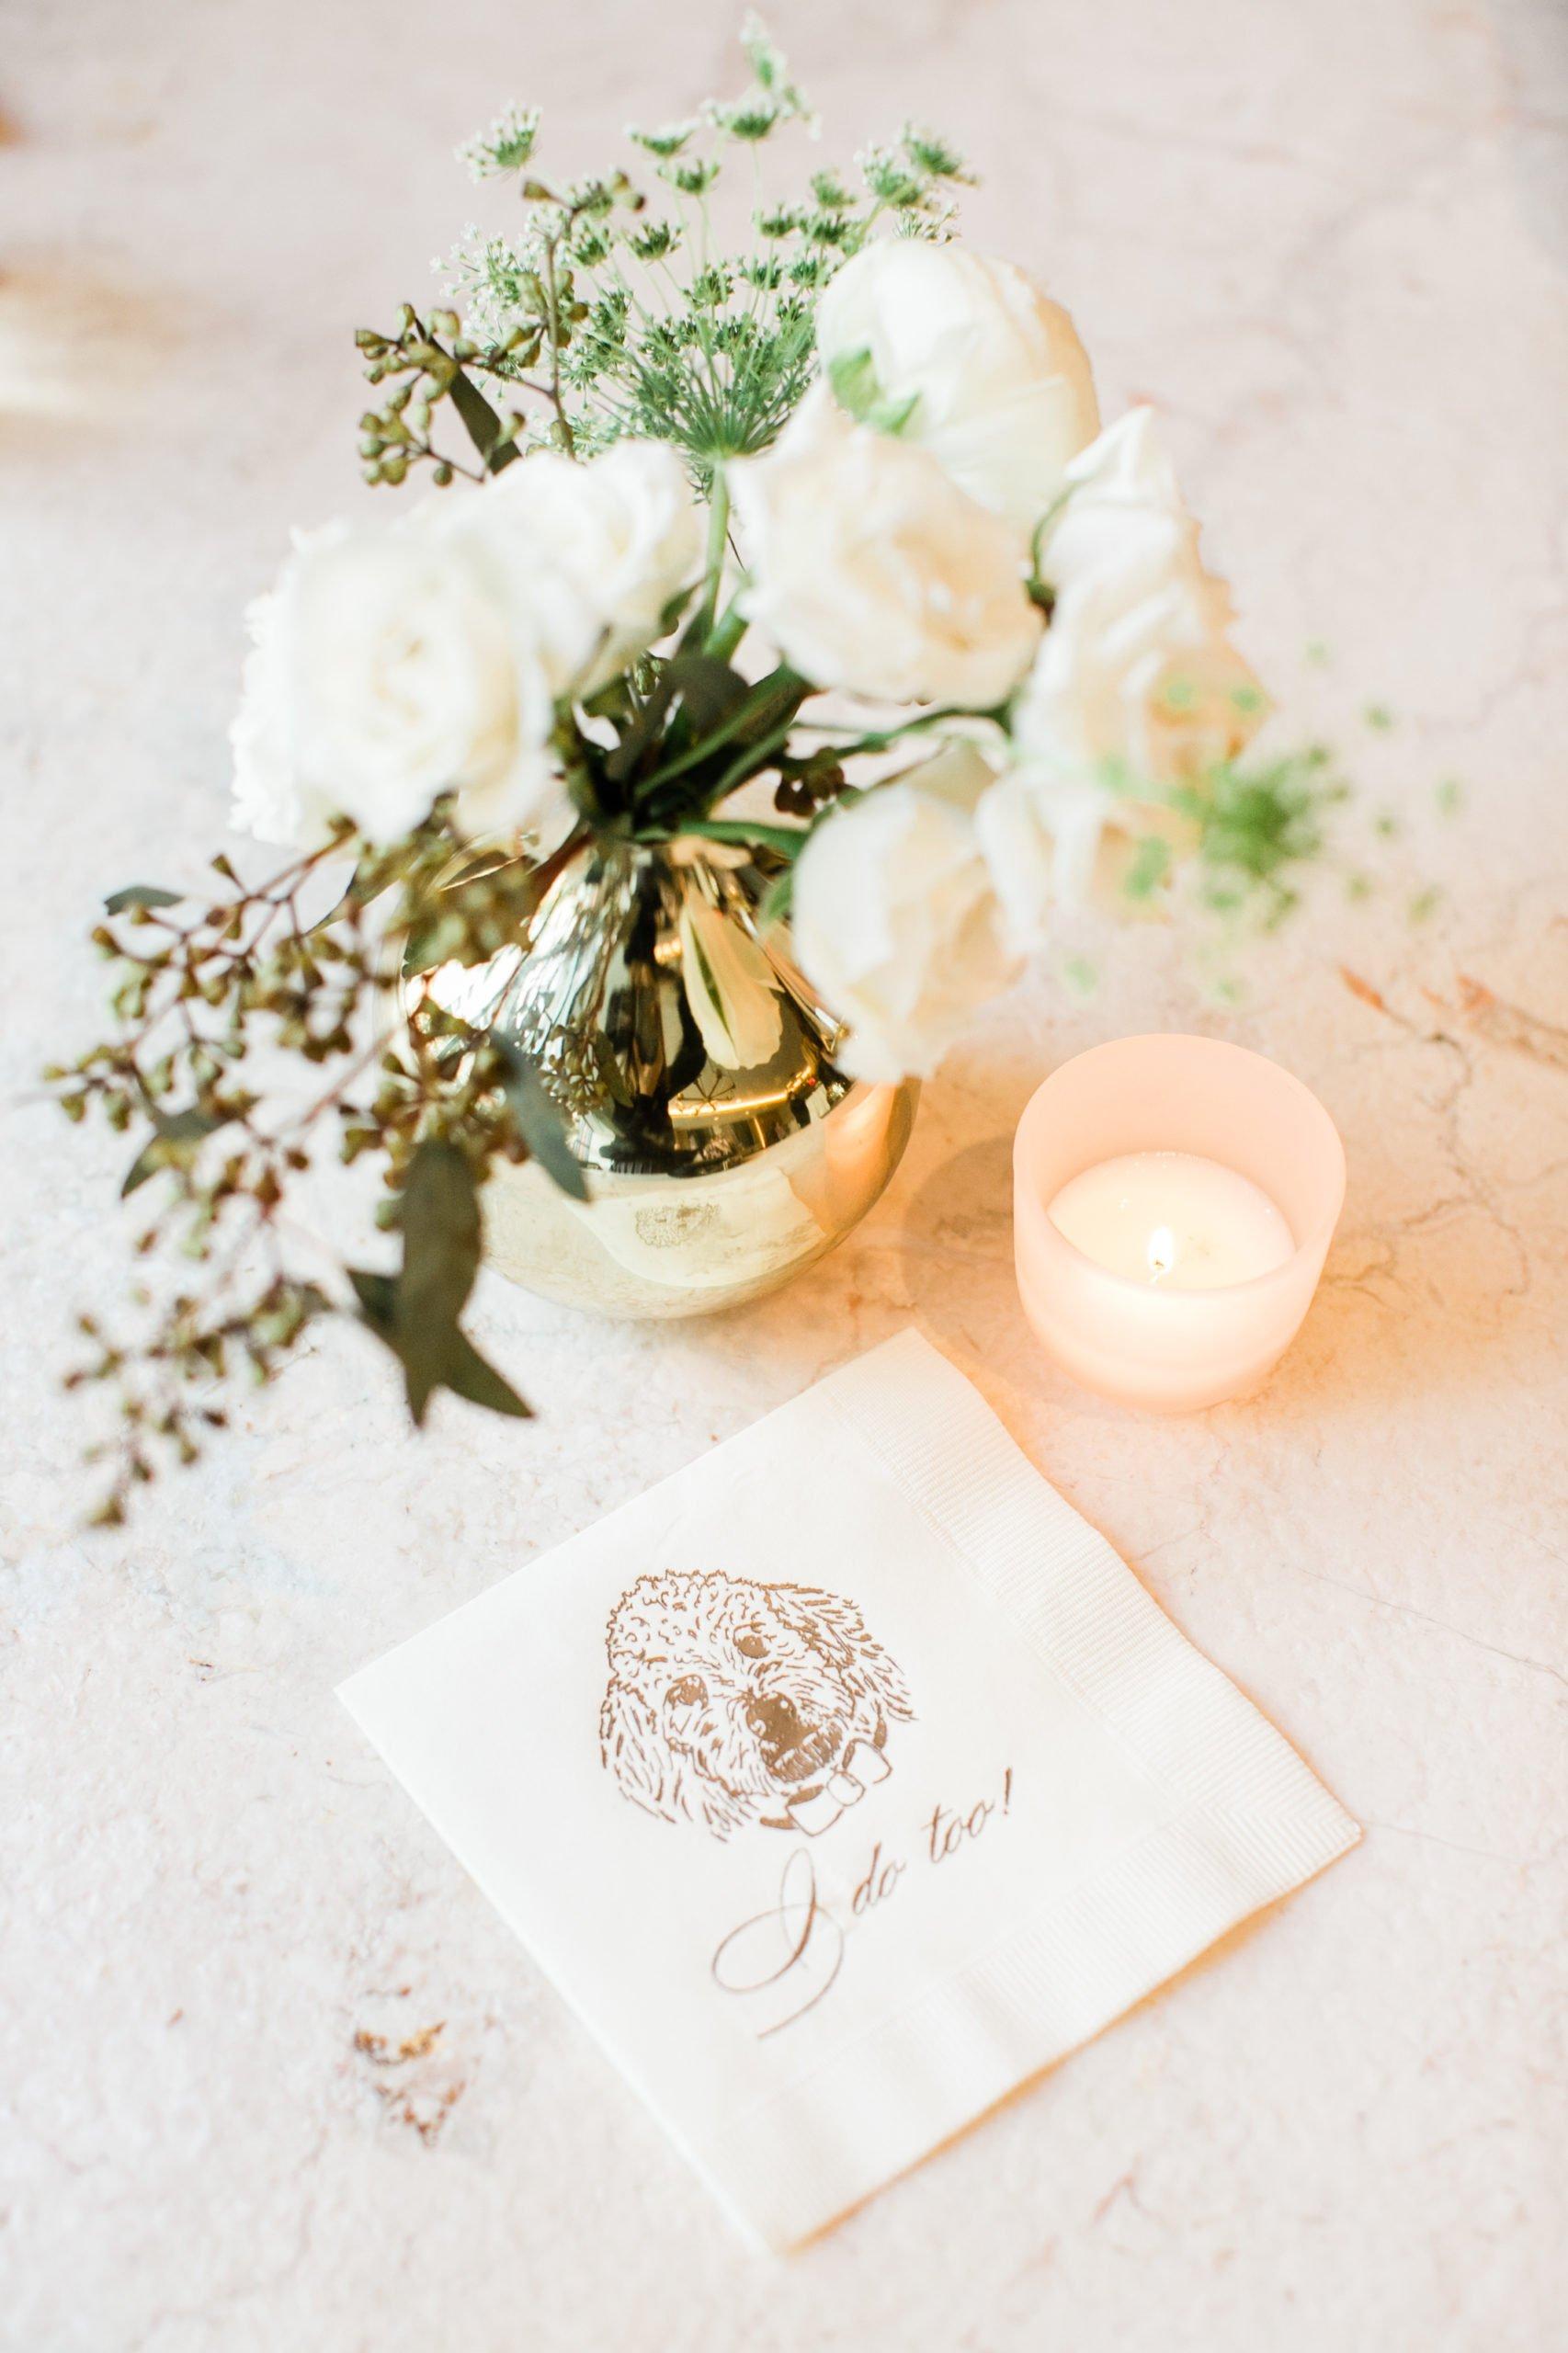 55Chesney_Travis_Intercontinental_Hote_DC_Wharf_Wedding_AstridPhotography_U7A6056